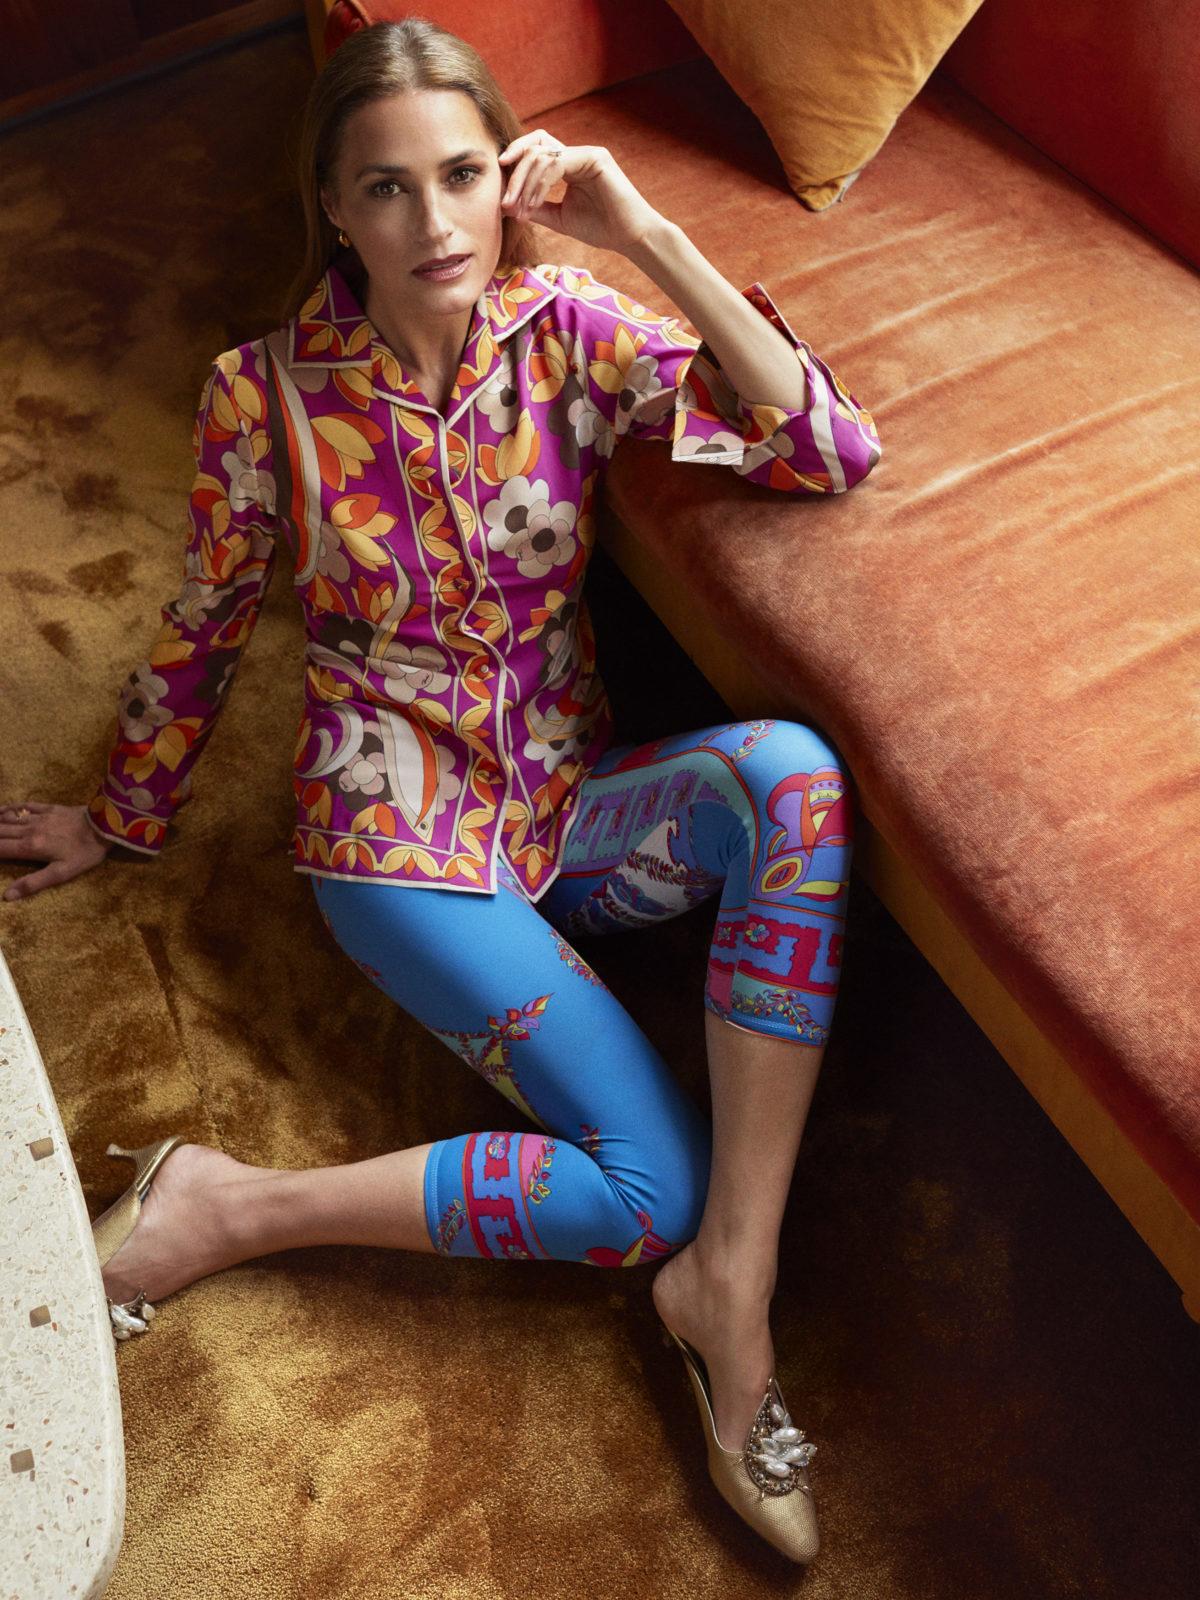 yasmin pucci leggings + shirt